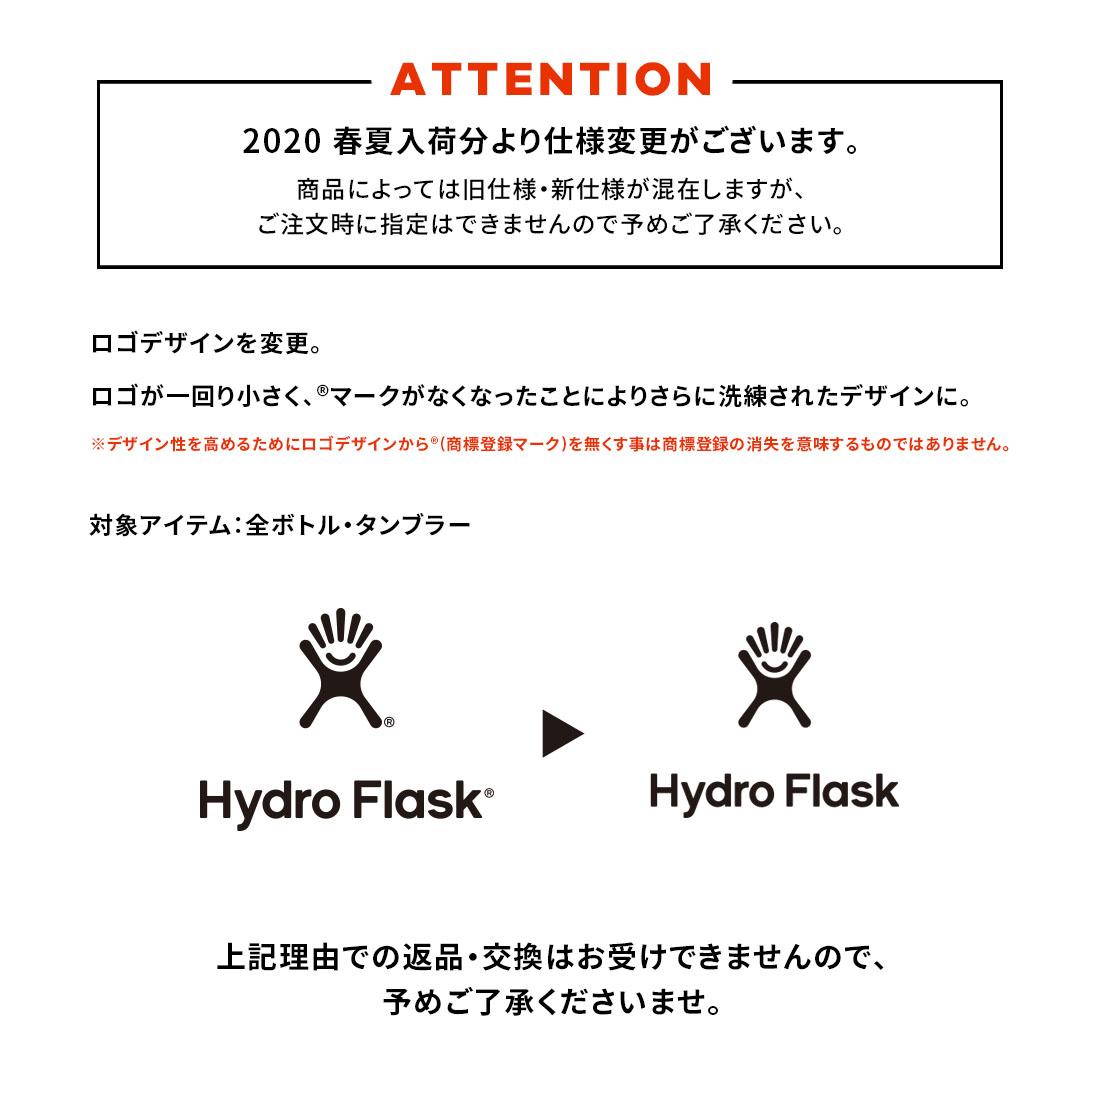 Hydro Flask[ハイドロフラスク]18oz Standard Mouth ステンレスボトル(532ml)メール便不可 5089013